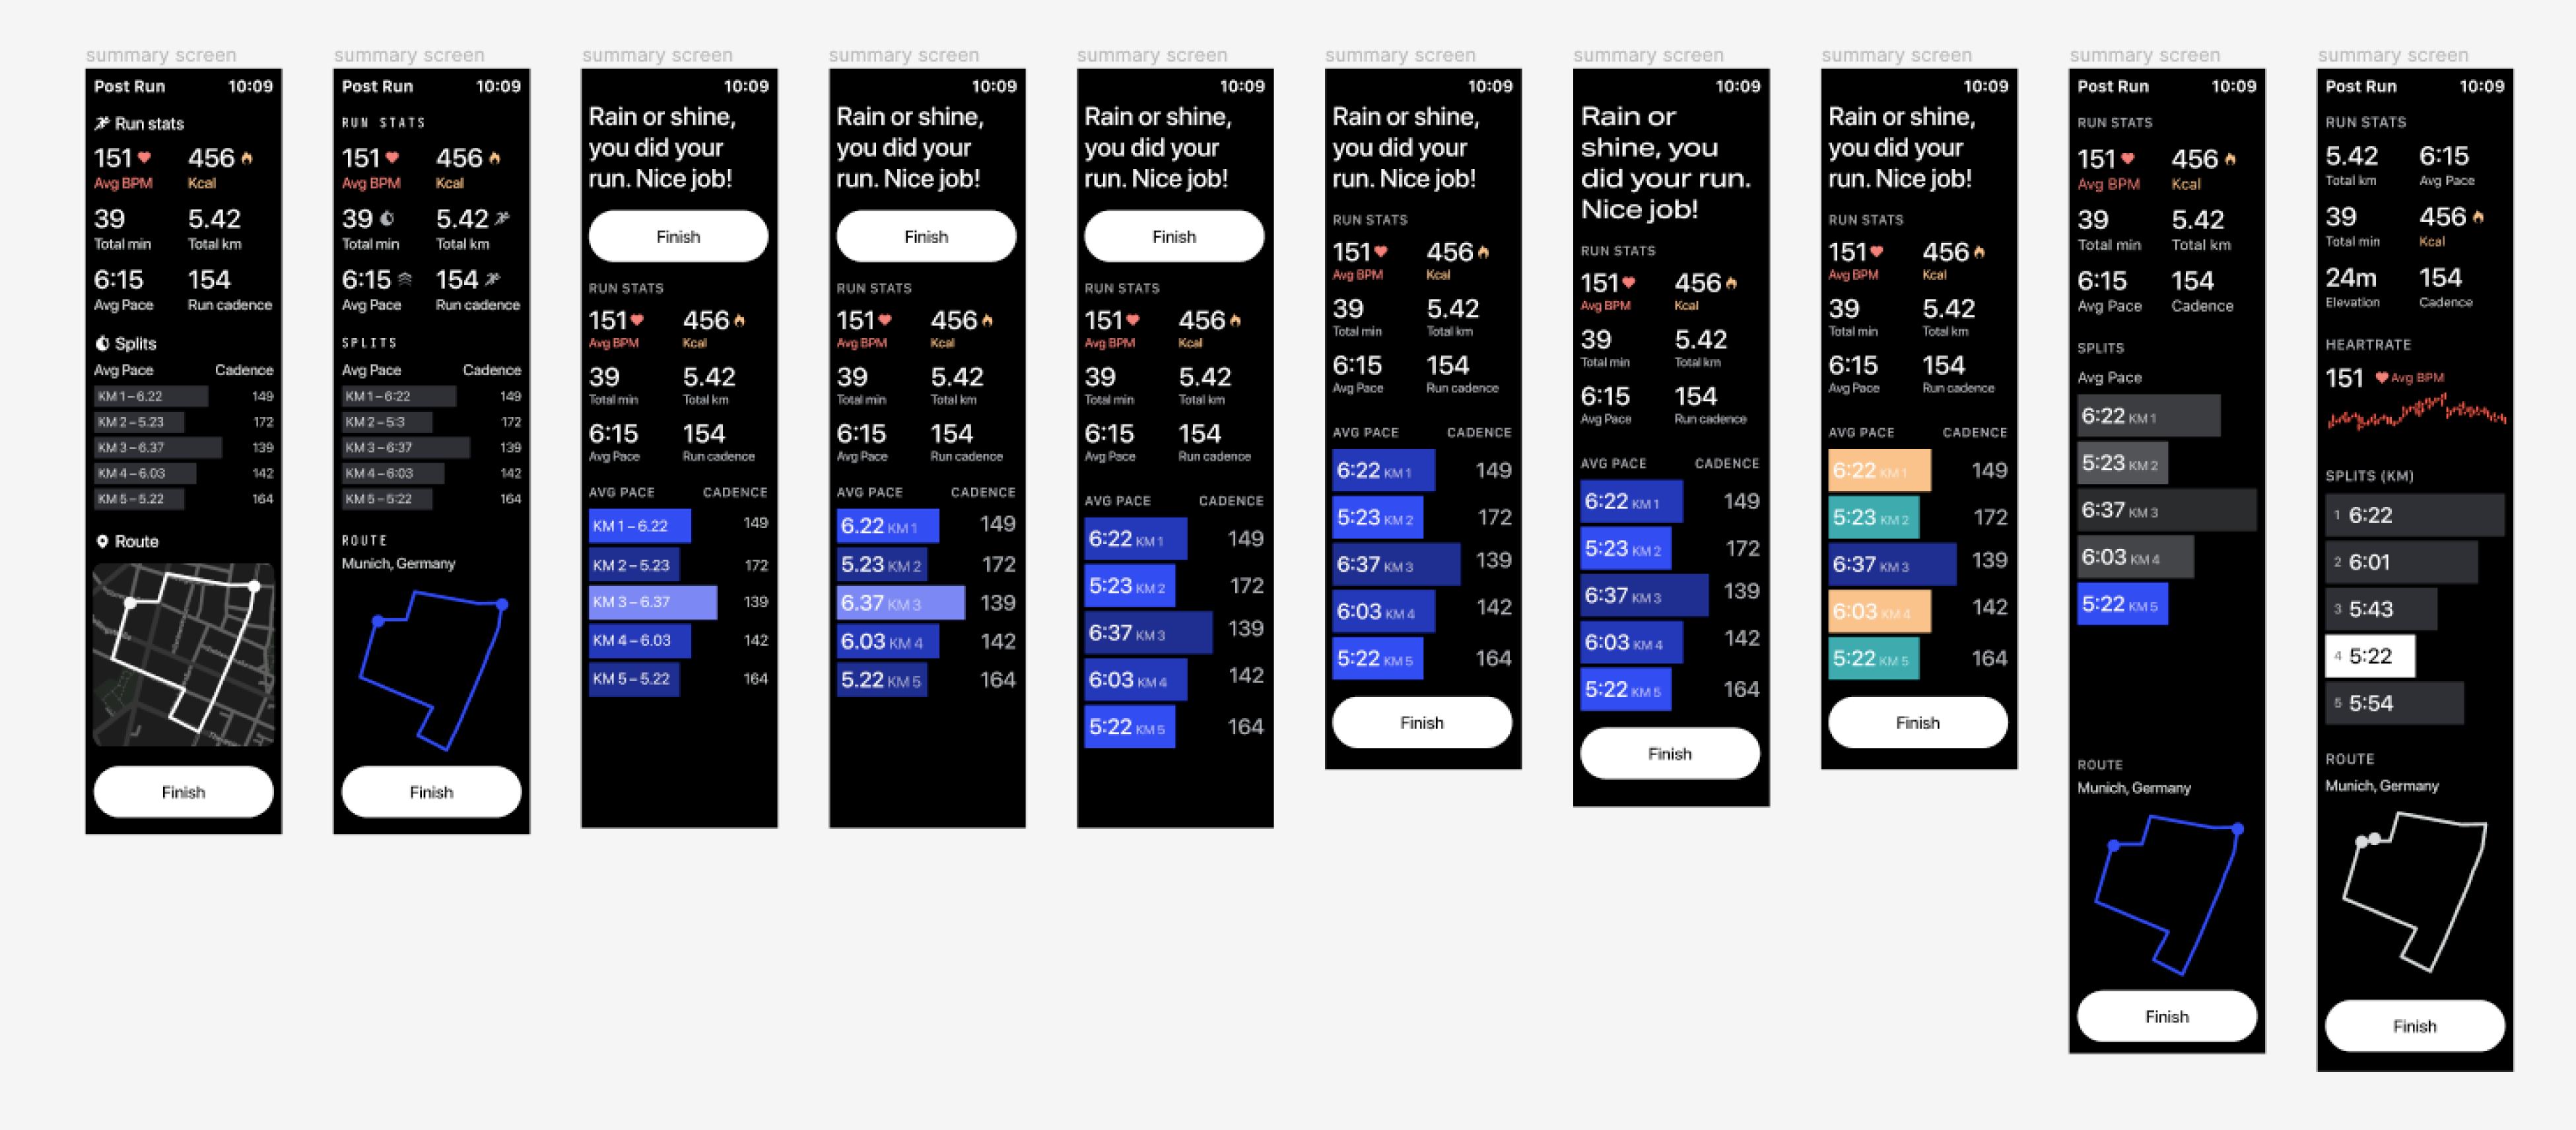 Visual iterations of the post-run summary screen